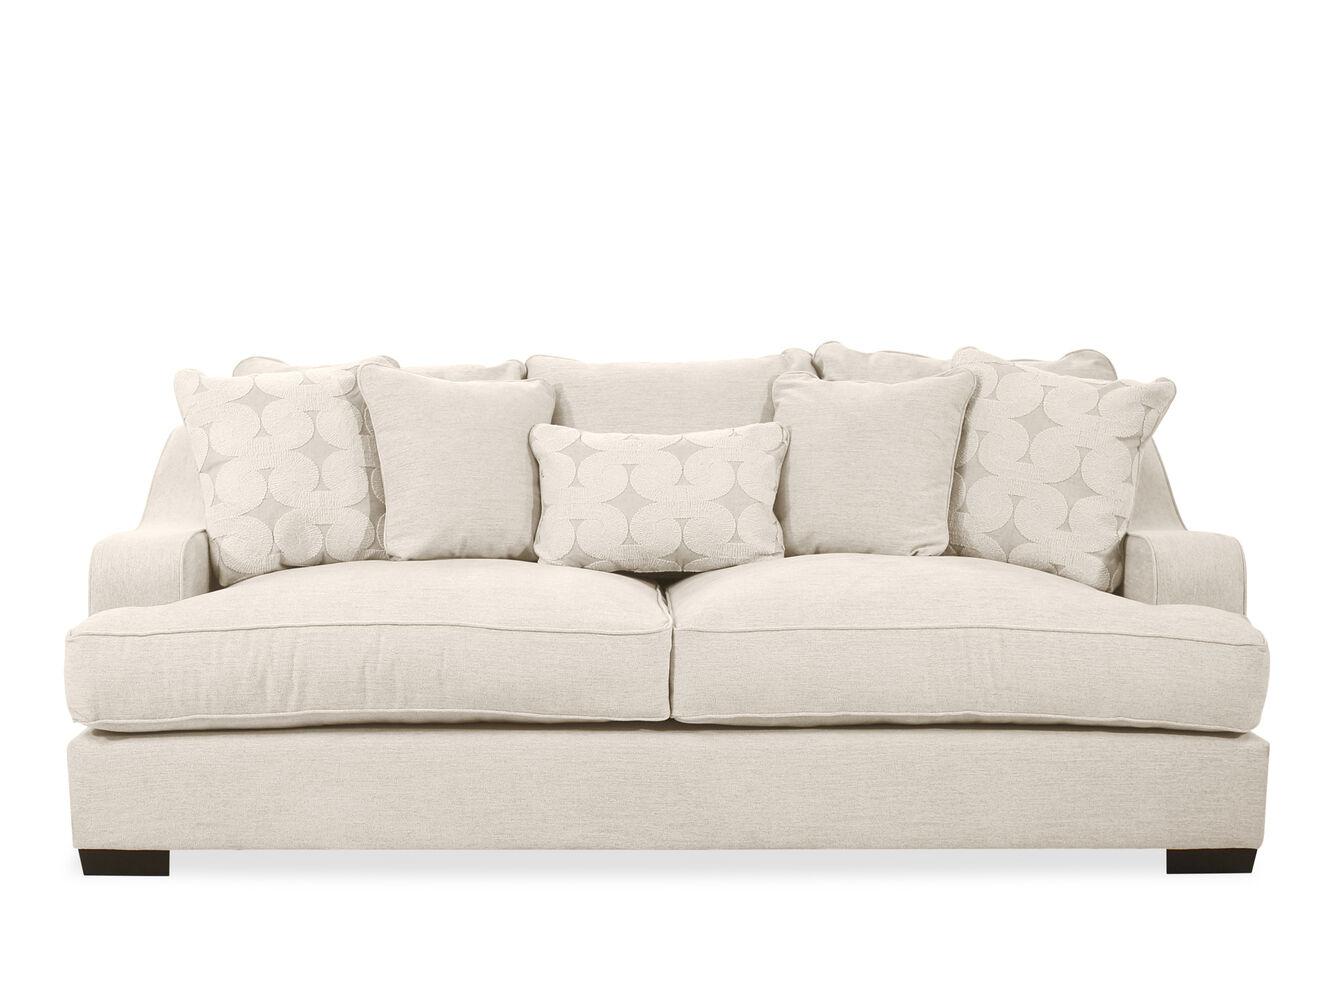 spartan sofa. Black Bedroom Furniture Sets. Home Design Ideas